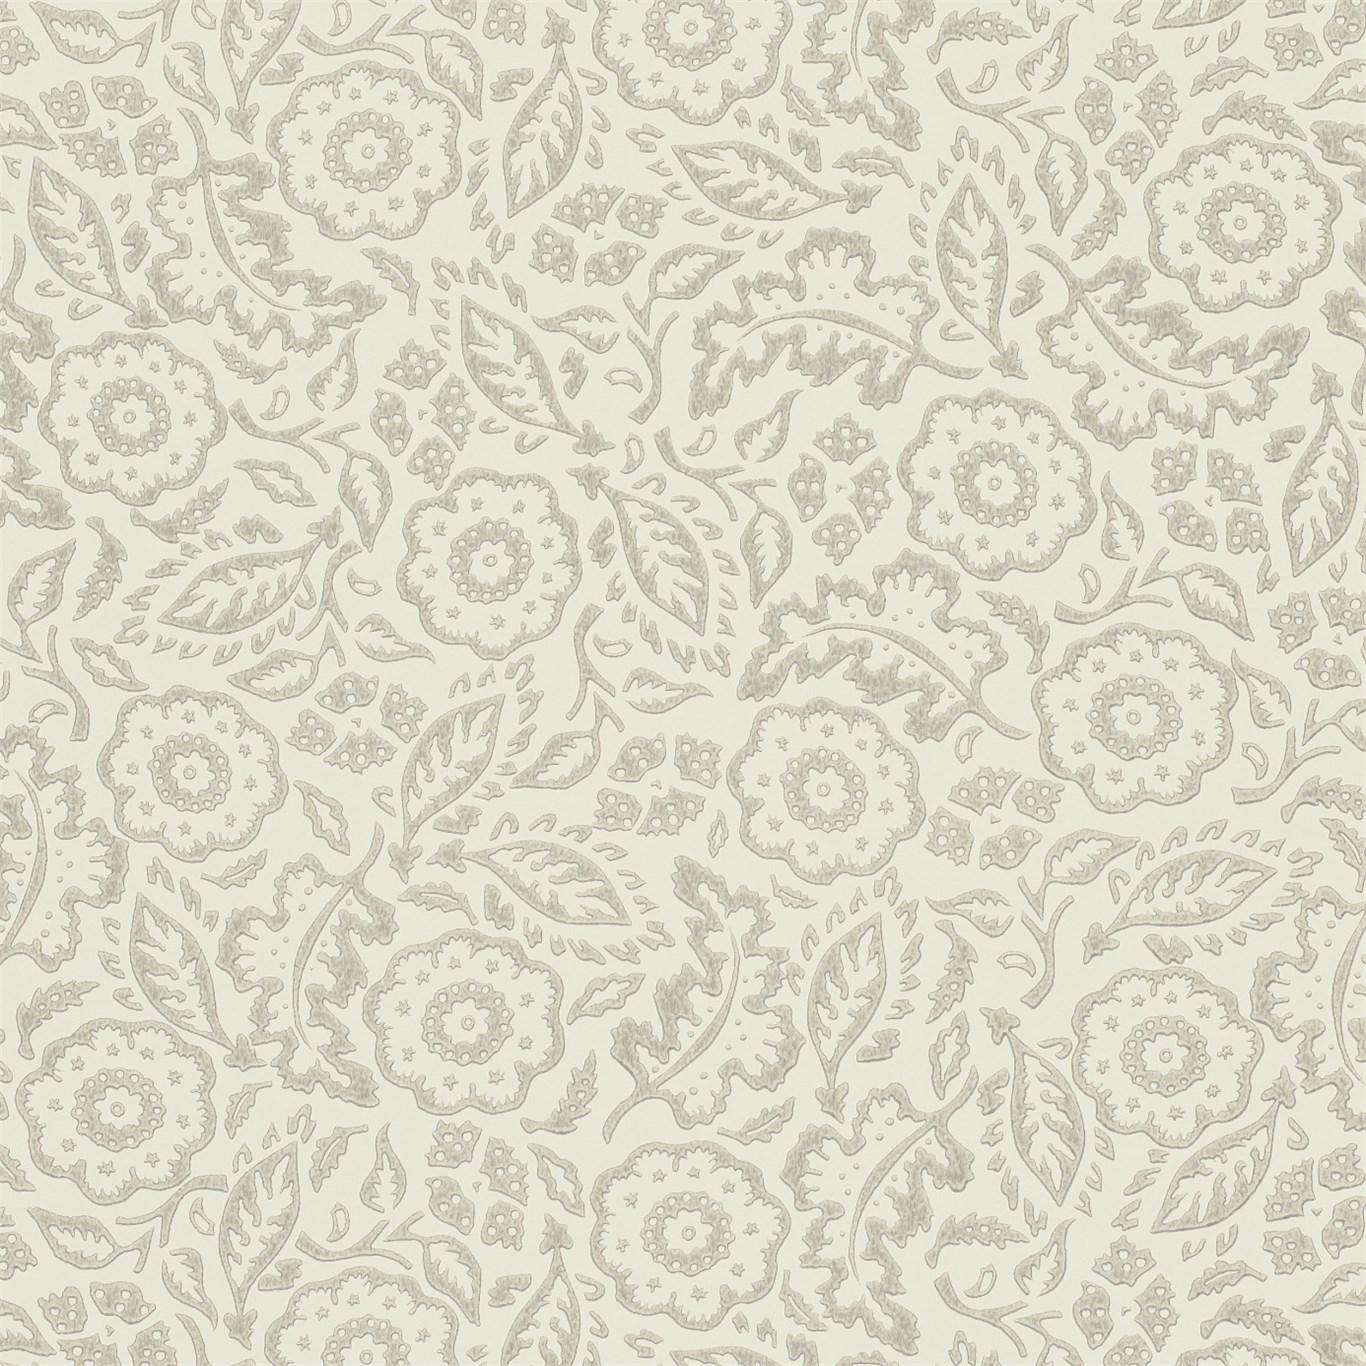 EB Tapet Floral Damask Silver